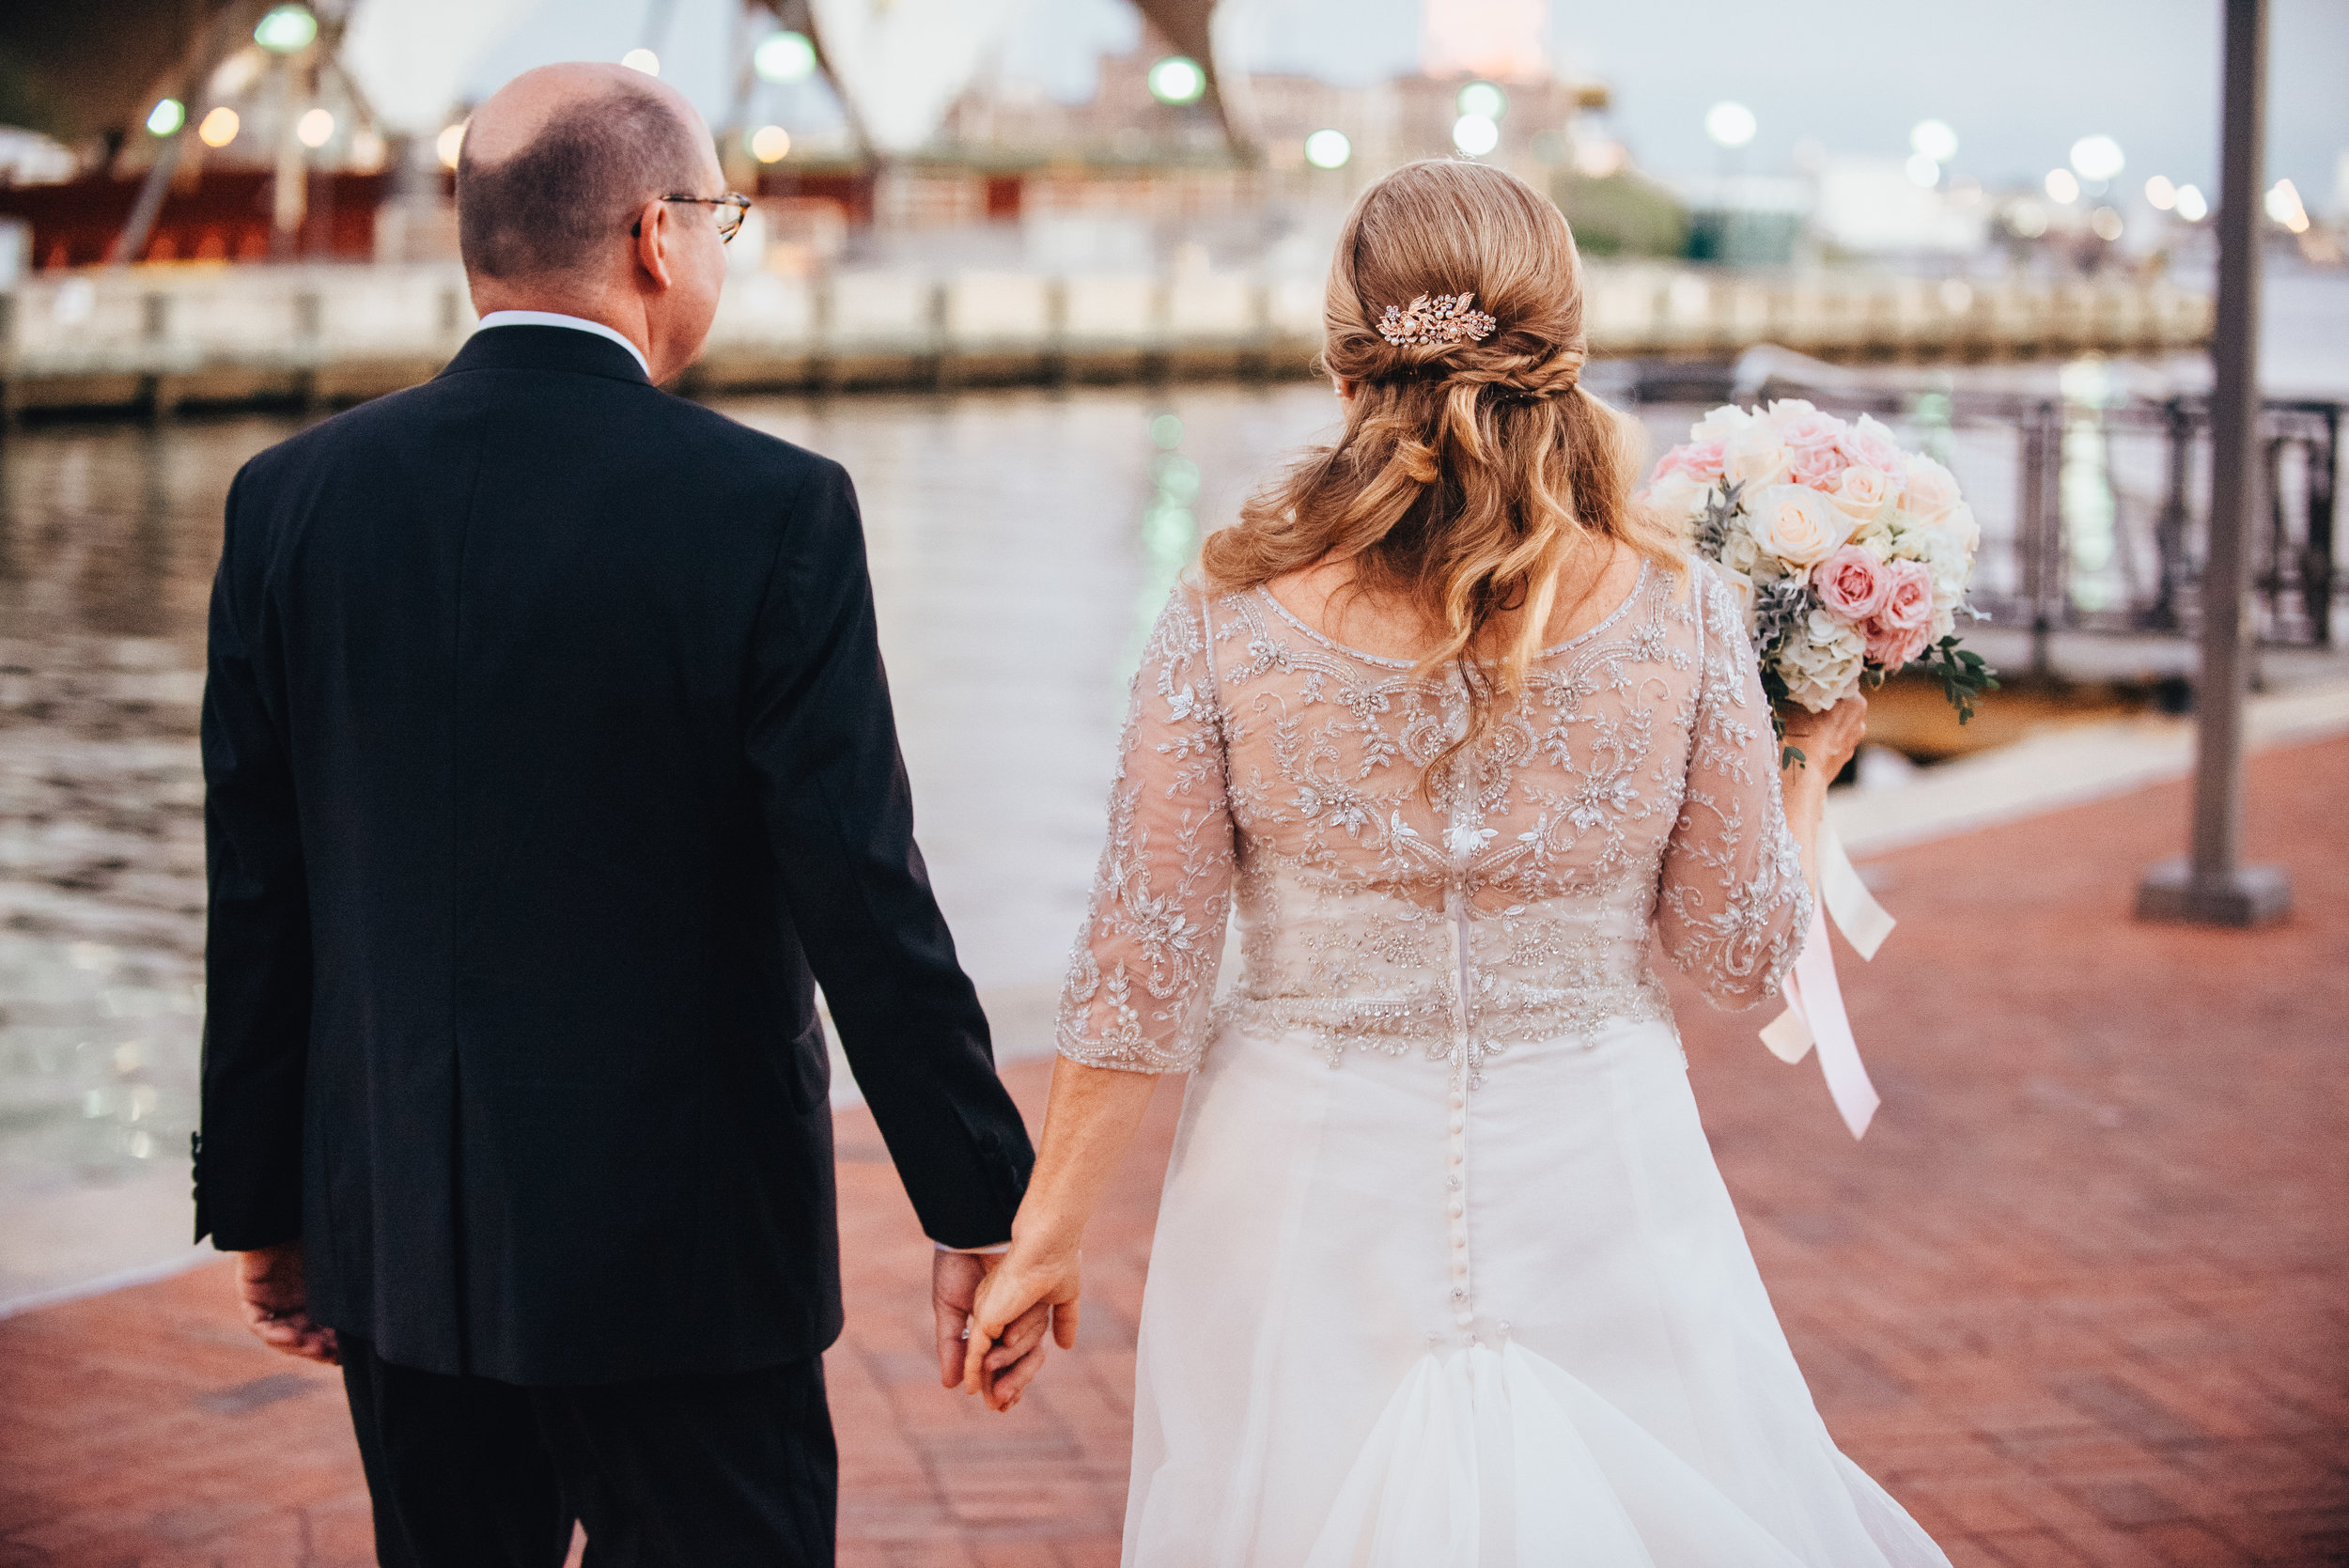 20180828_weddingwebsite_small_25.jpg